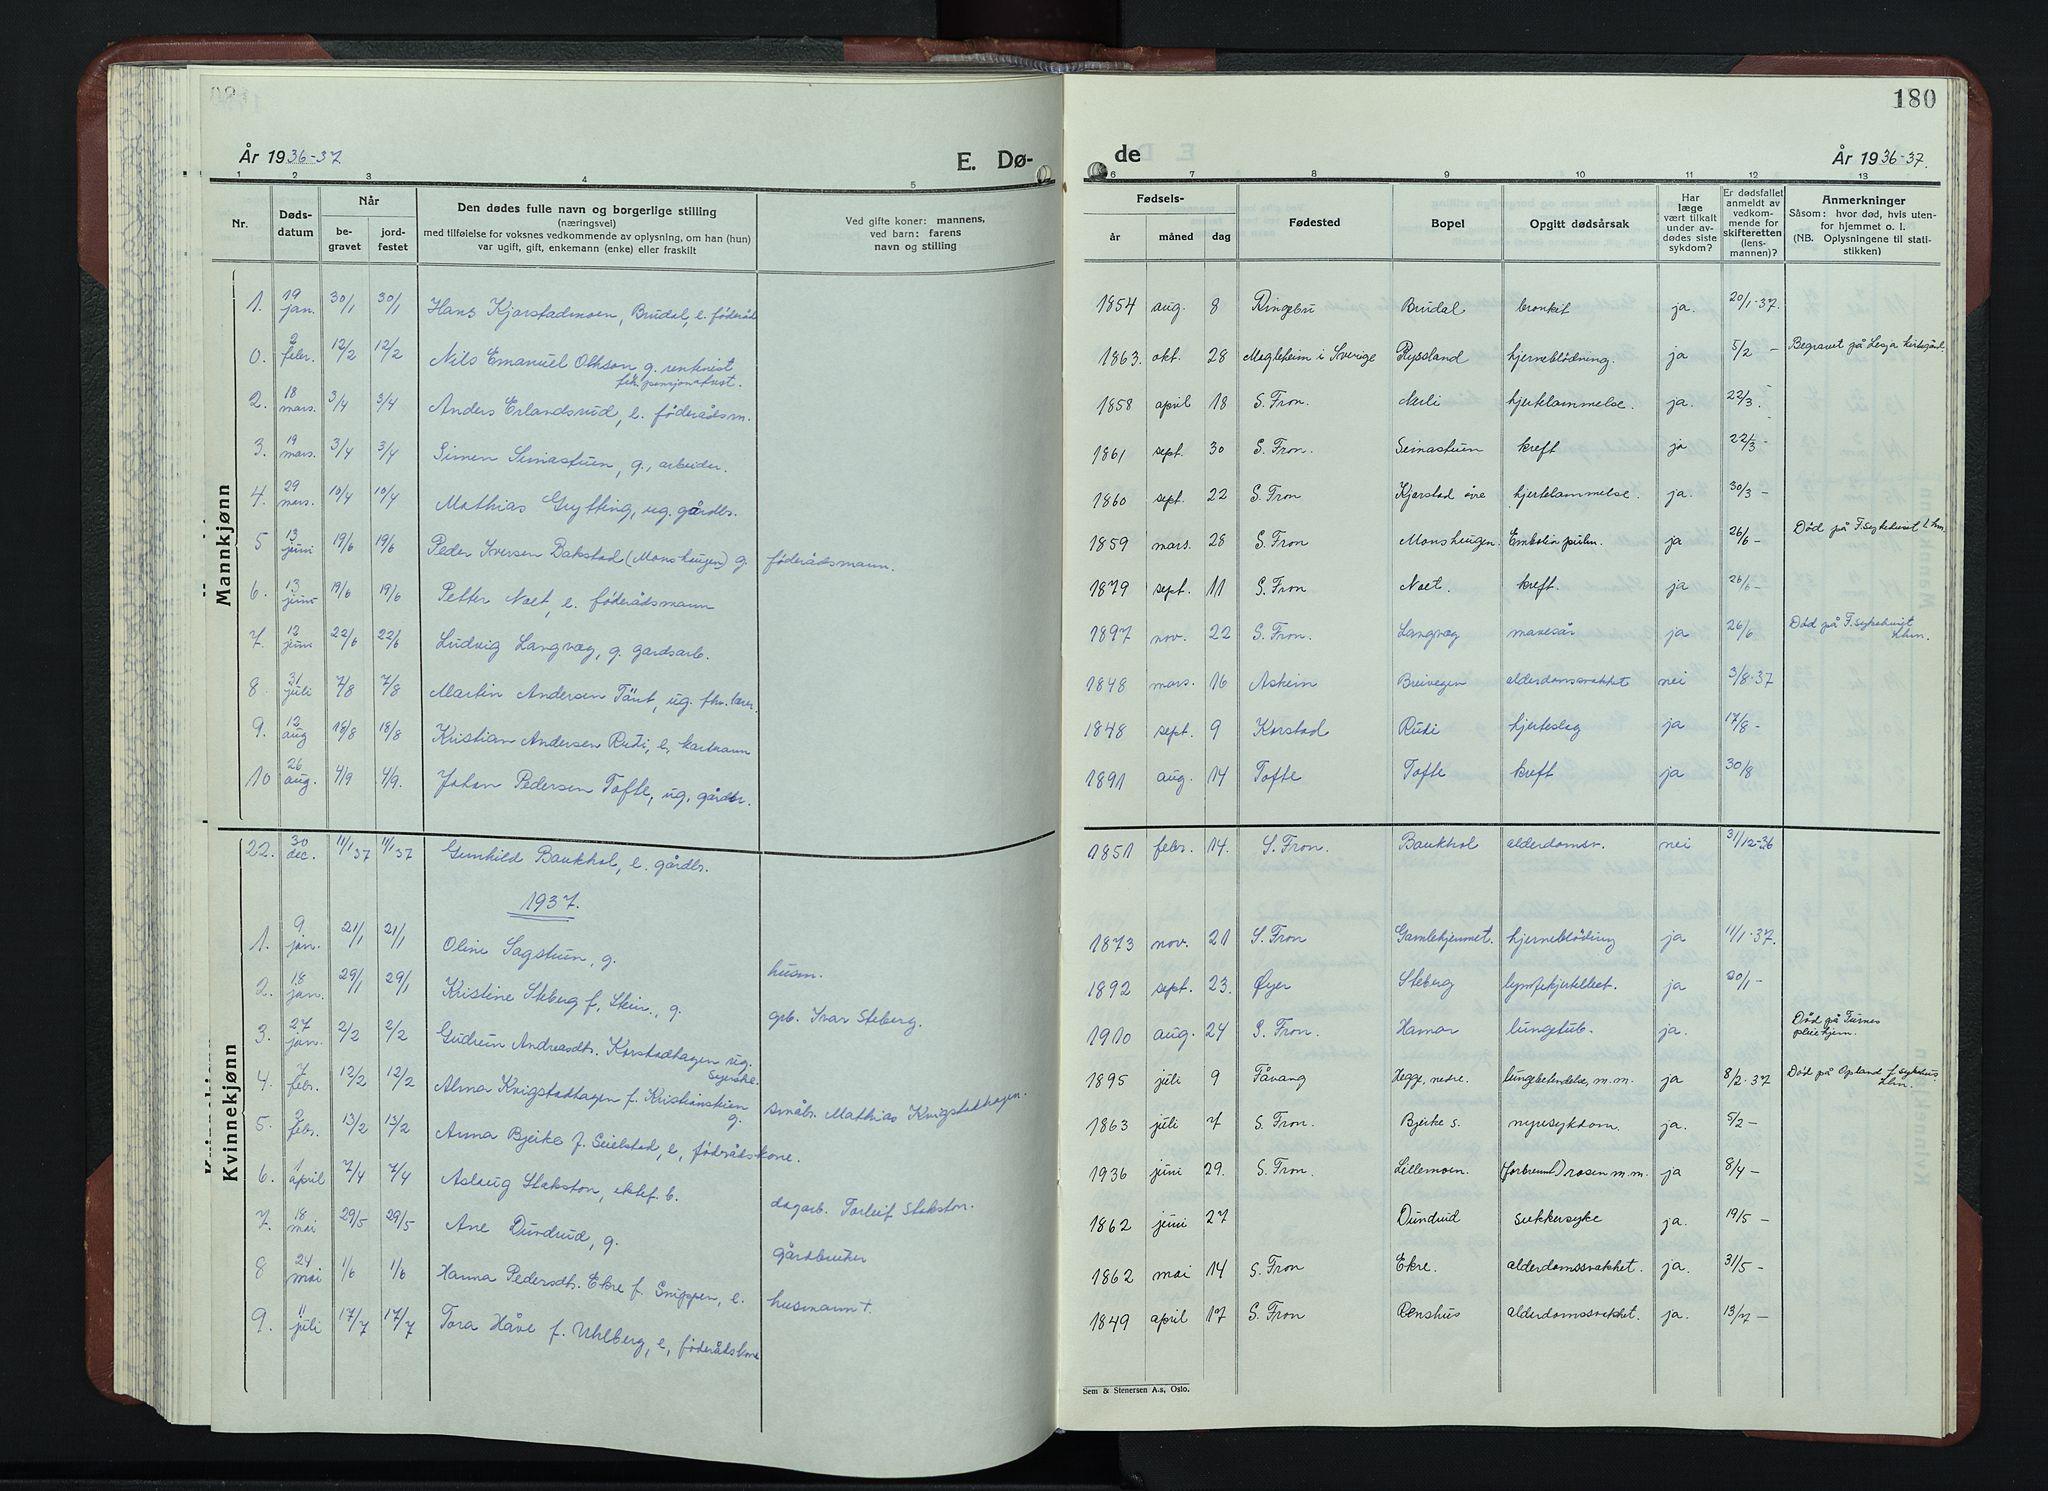 SAH, Sør-Fron prestekontor, H/Ha/Hab/L0006: Klokkerbok nr. 6, 1933-1948, s. 180